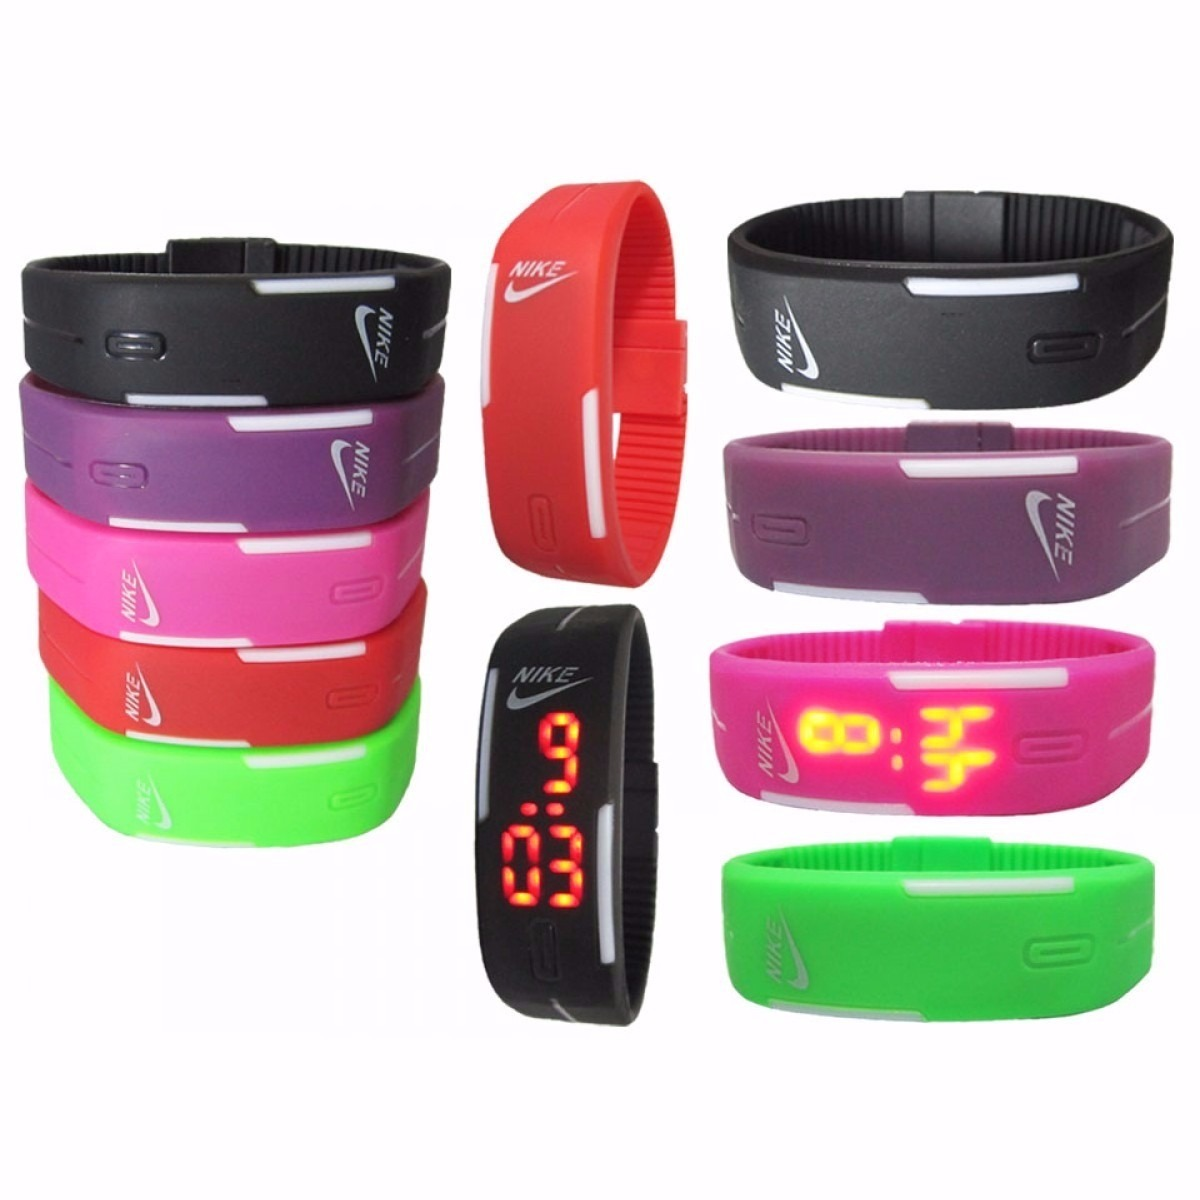 3dac2875225 Revenda Relogio Nike Digital Led Watch Silicone Kit - R  110